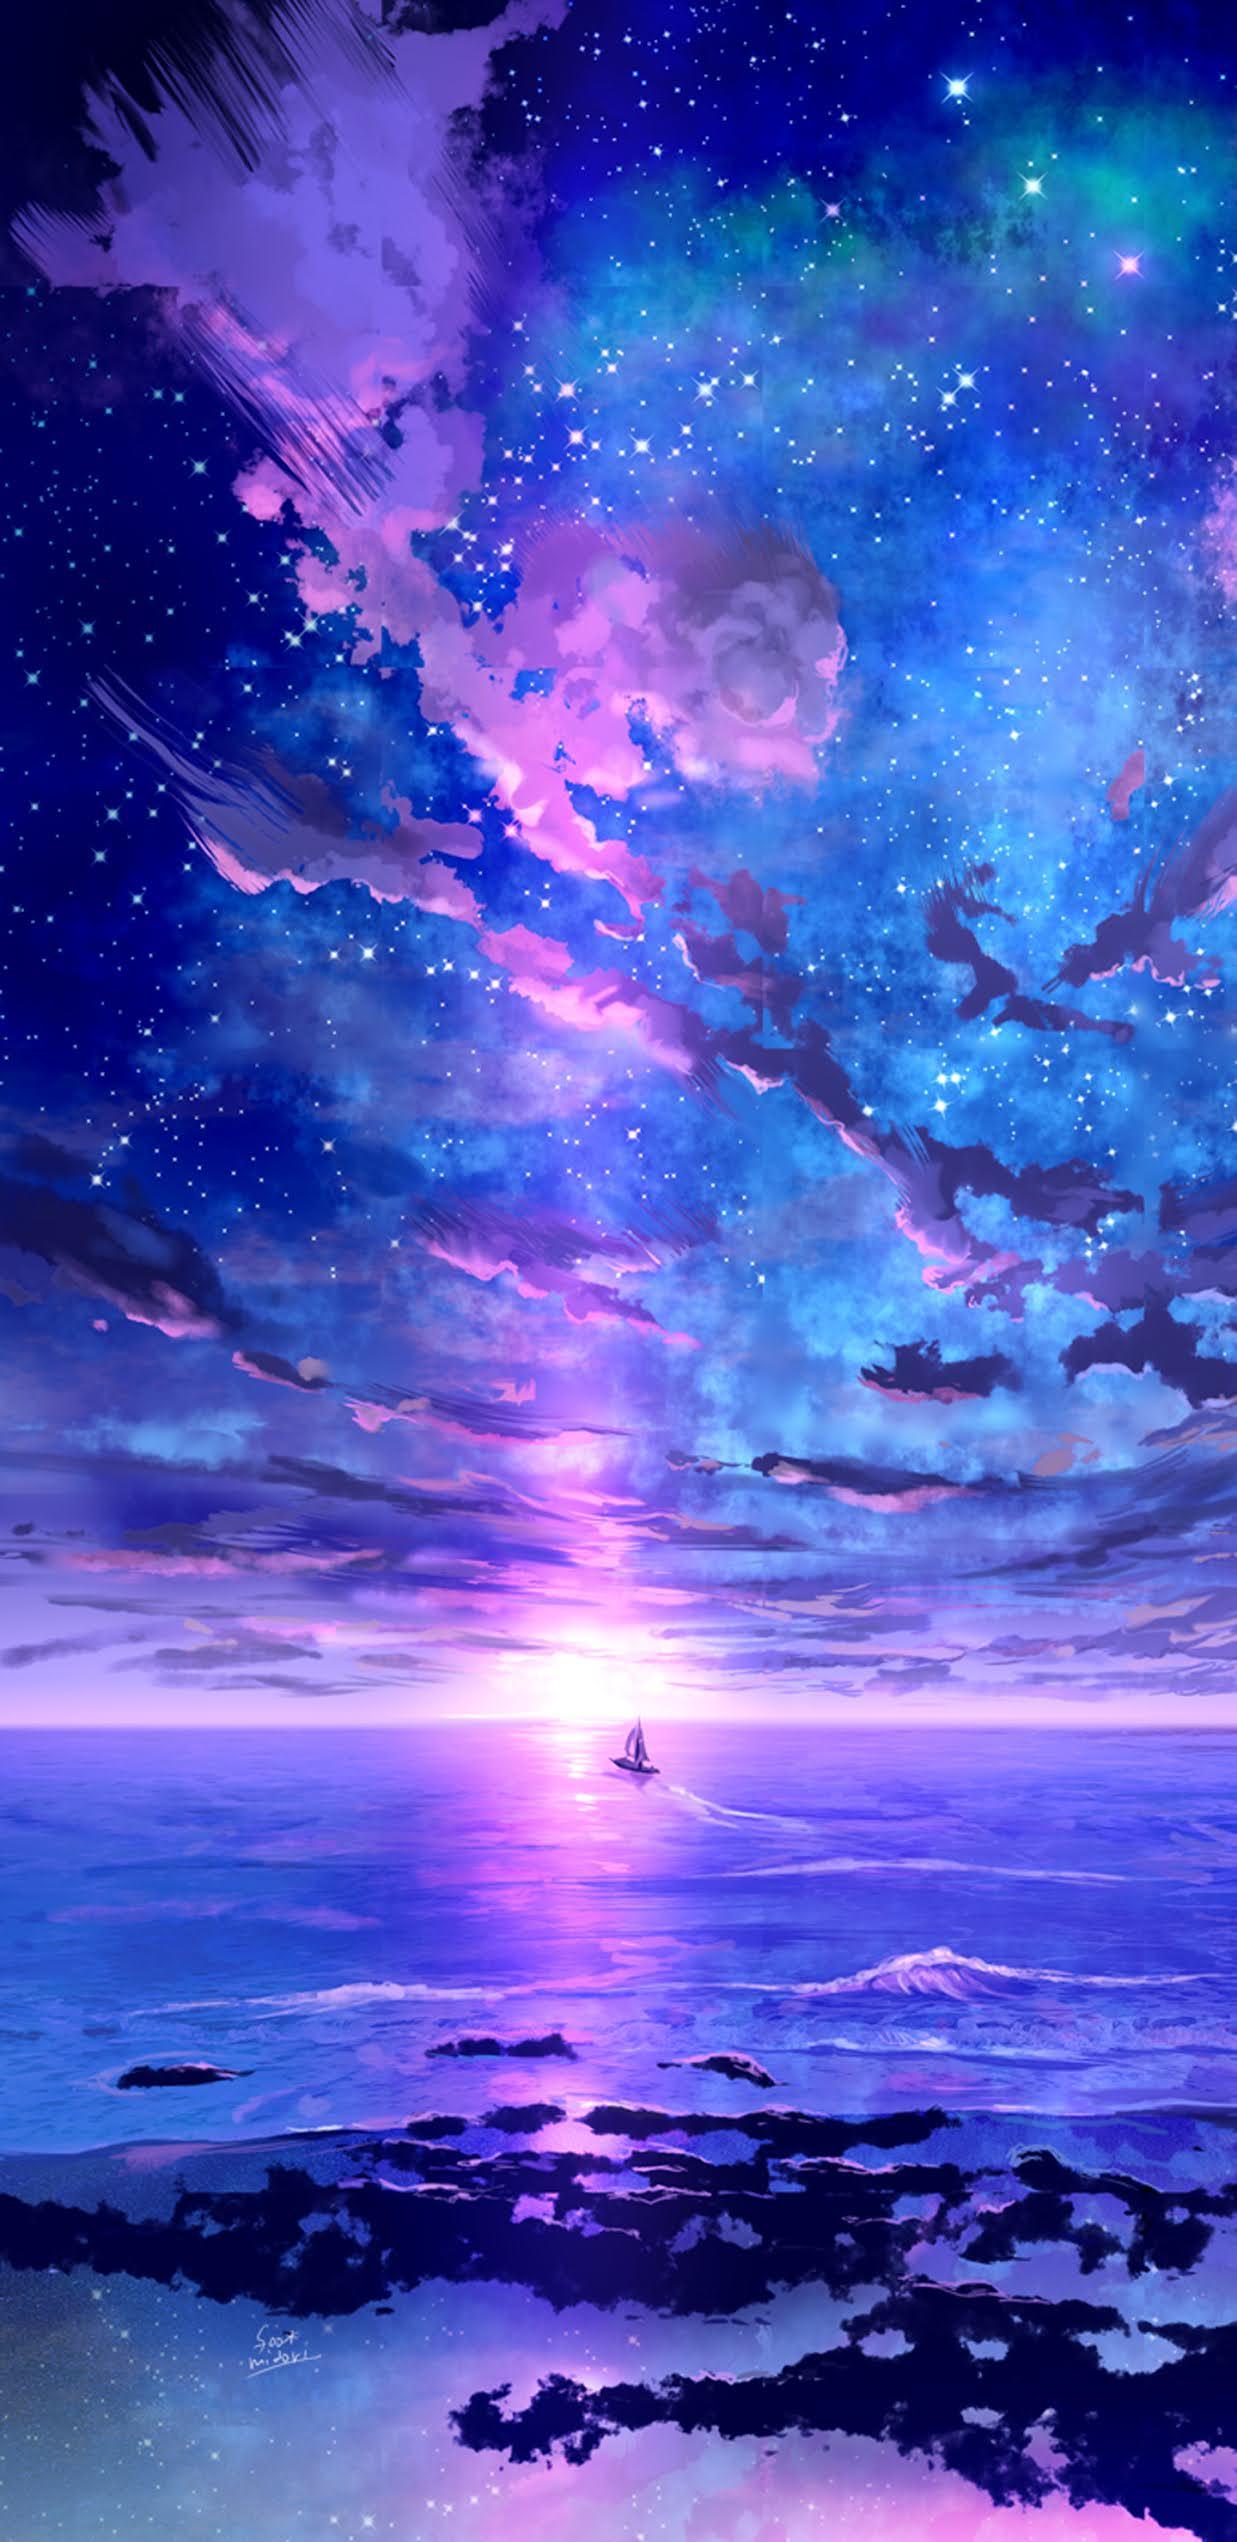 Bầu trời đầy sao